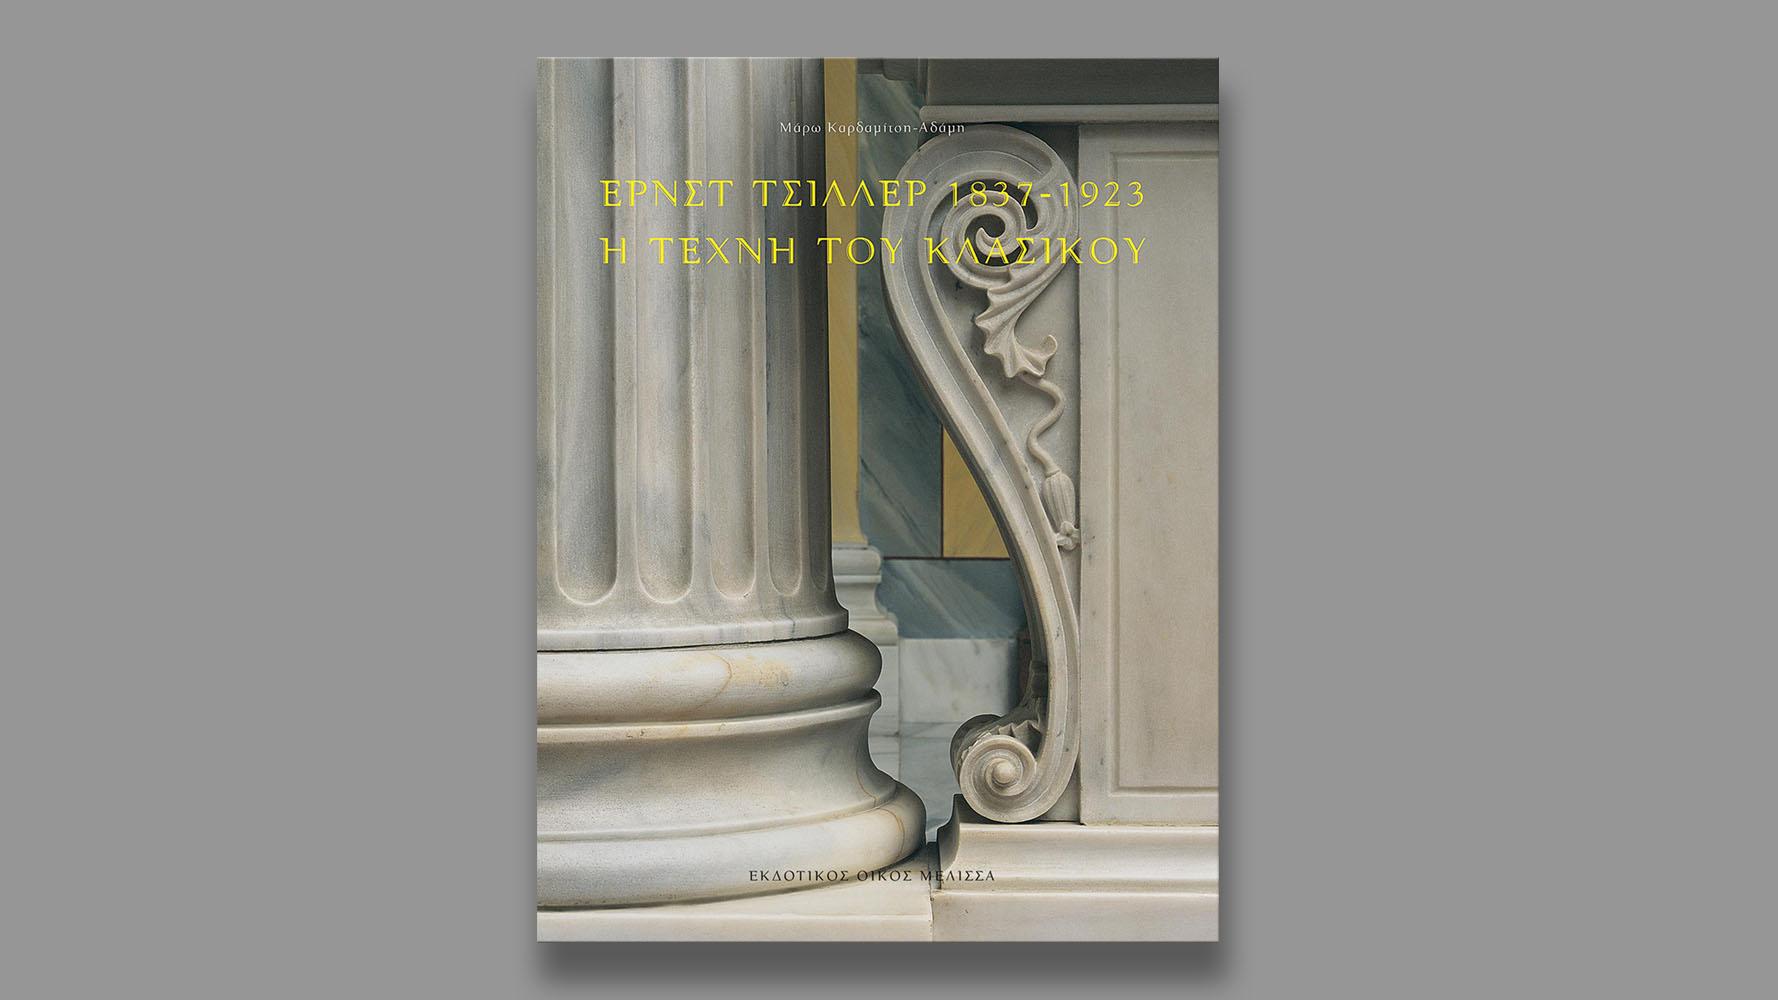 Classic Revival, Ernst Ziller 1837-1923, Melissa books, 2006